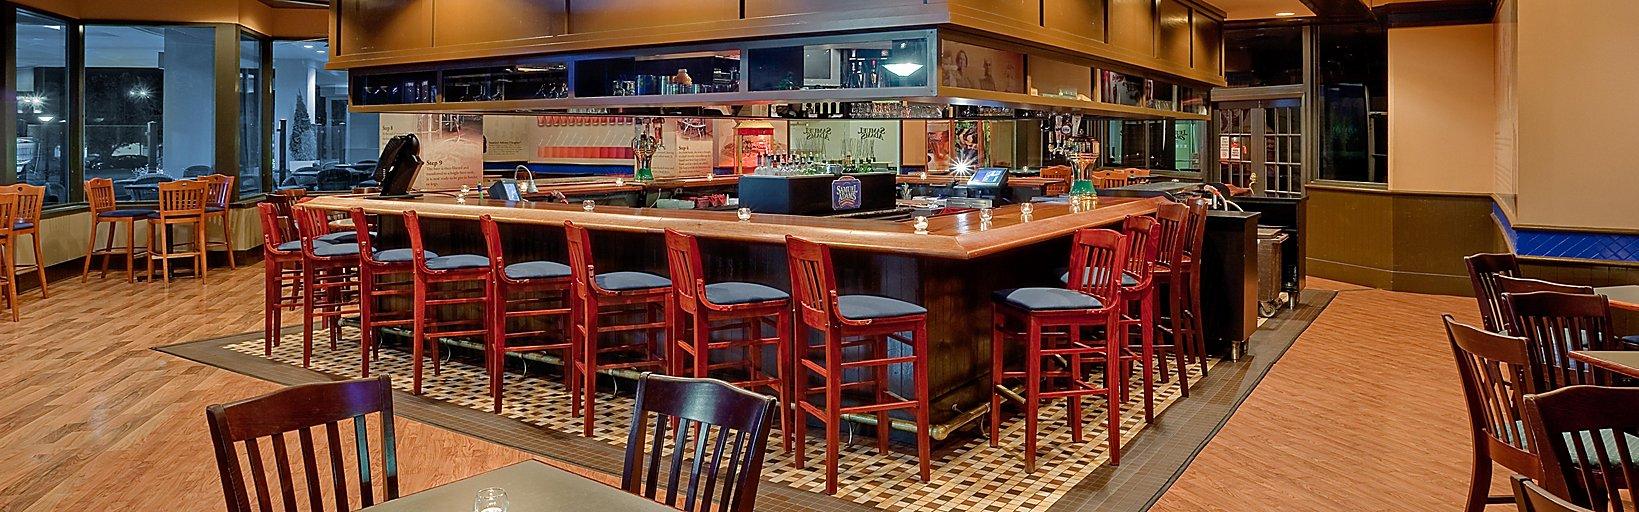 Restaurants Near Holiday Inn Allentown I 78 Lehigh Valley